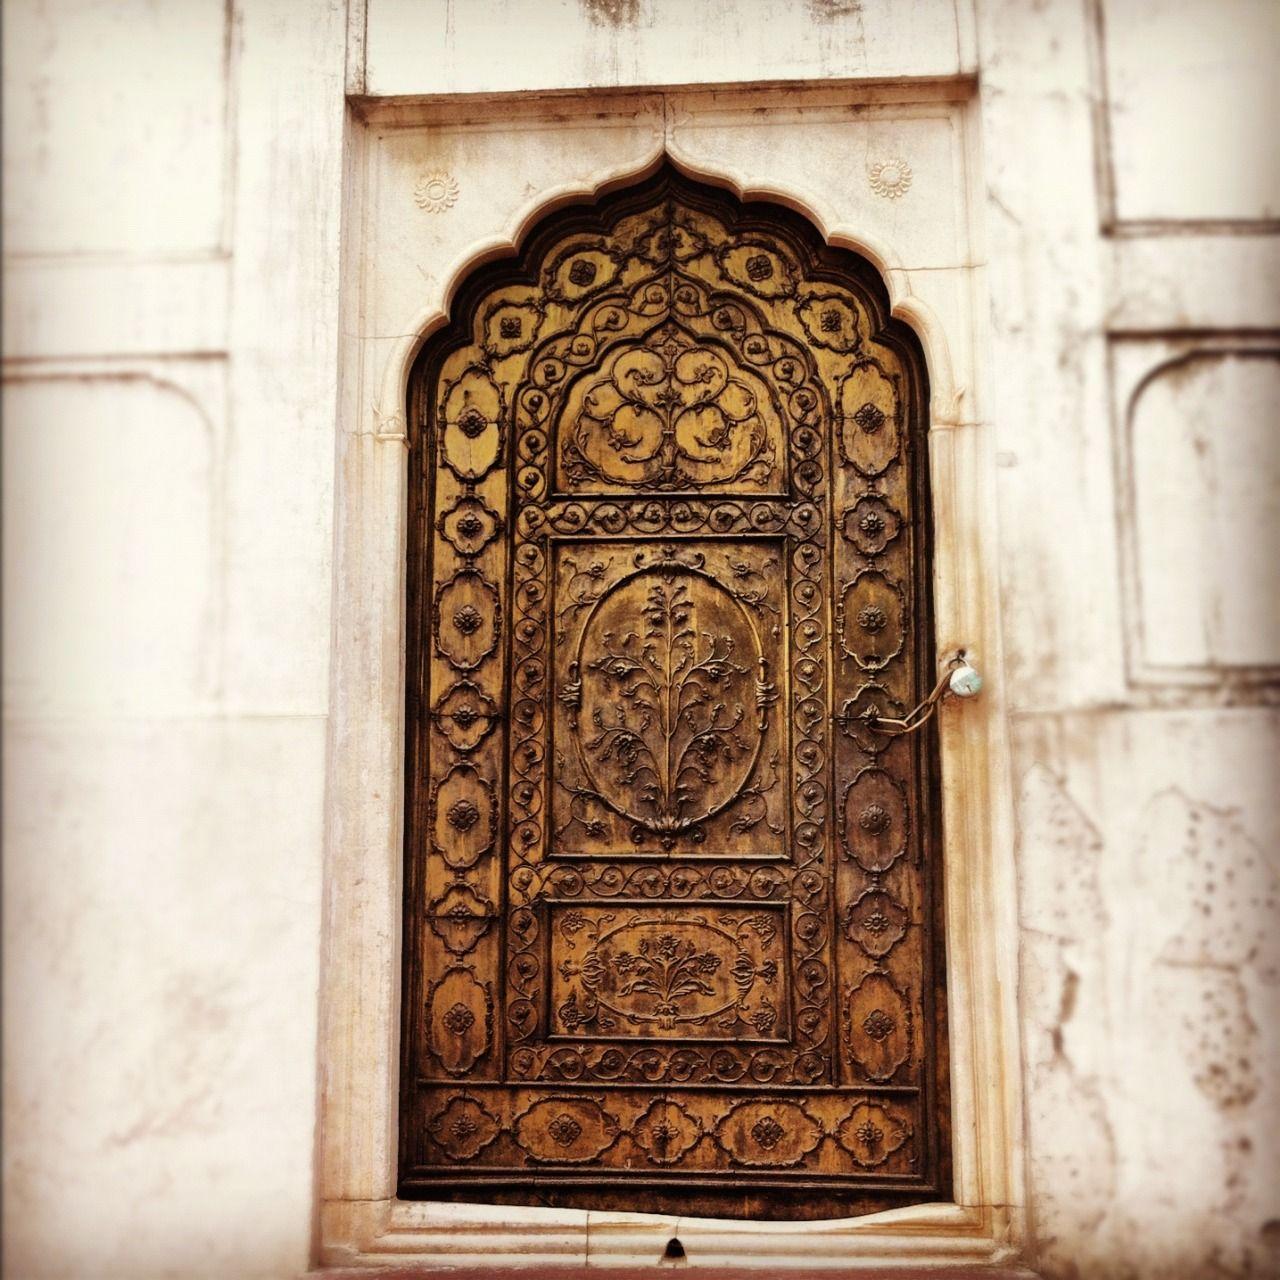 two-browngirls u201c Aurangzebu0027s door to the Moti Masjid. - S u201d & two-browngirls: u201c Aurangzebu0027s door to the Moti Masjid. - S ... pezcame.com